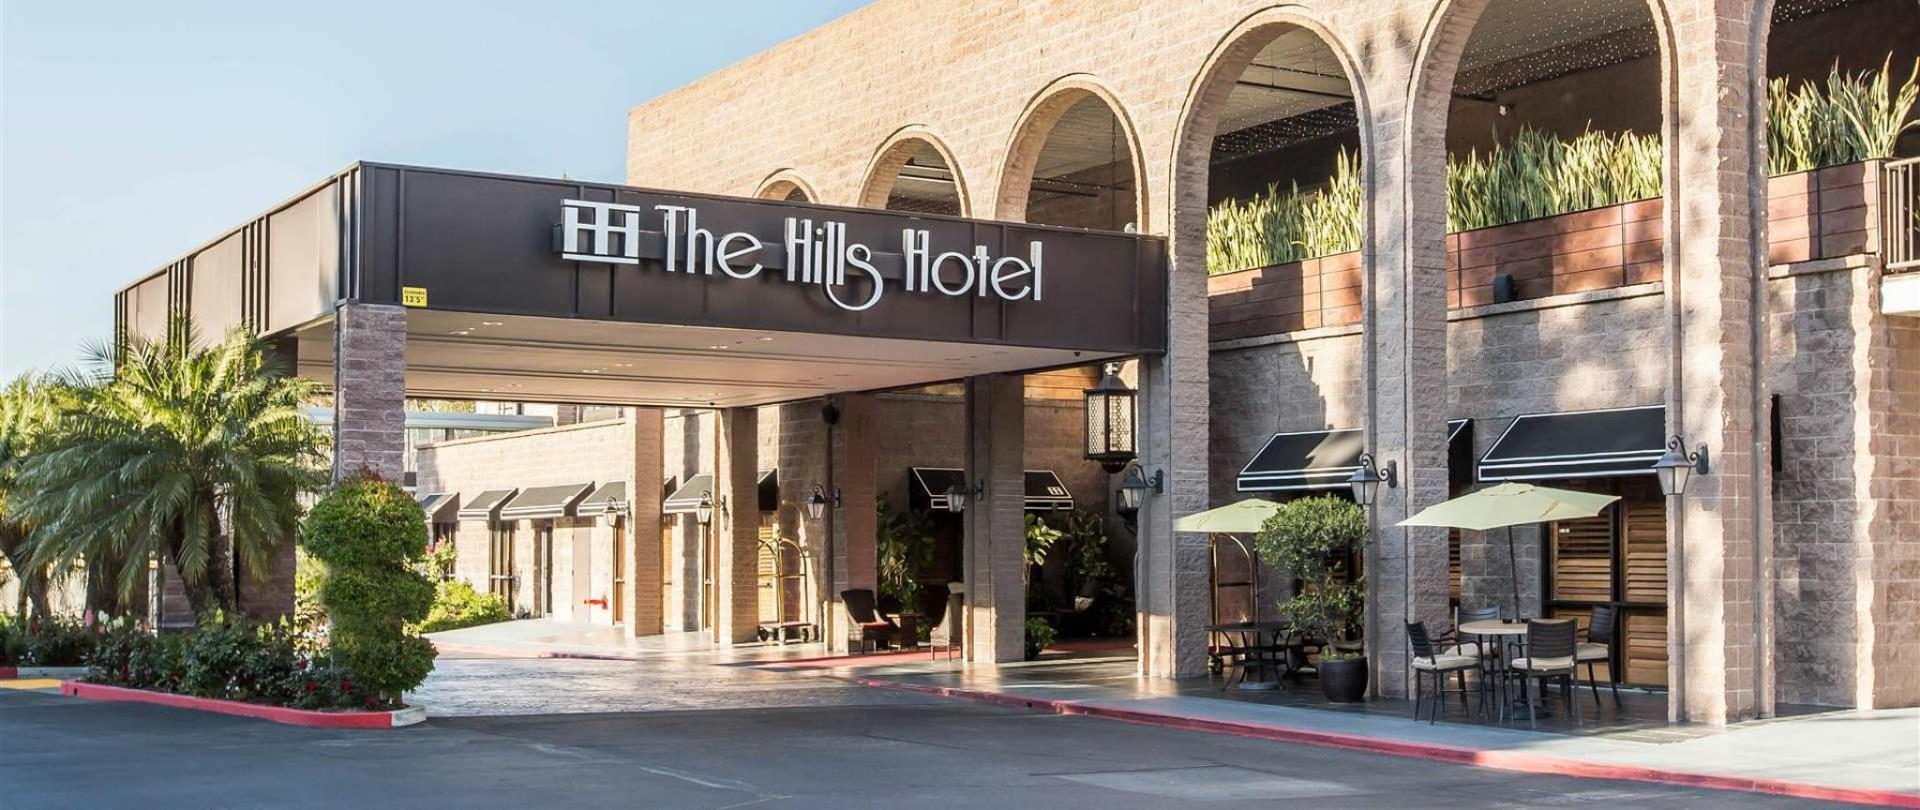 hotel-front.png.1920x810_0_427_10000.jpeg.1920x0.jpeg